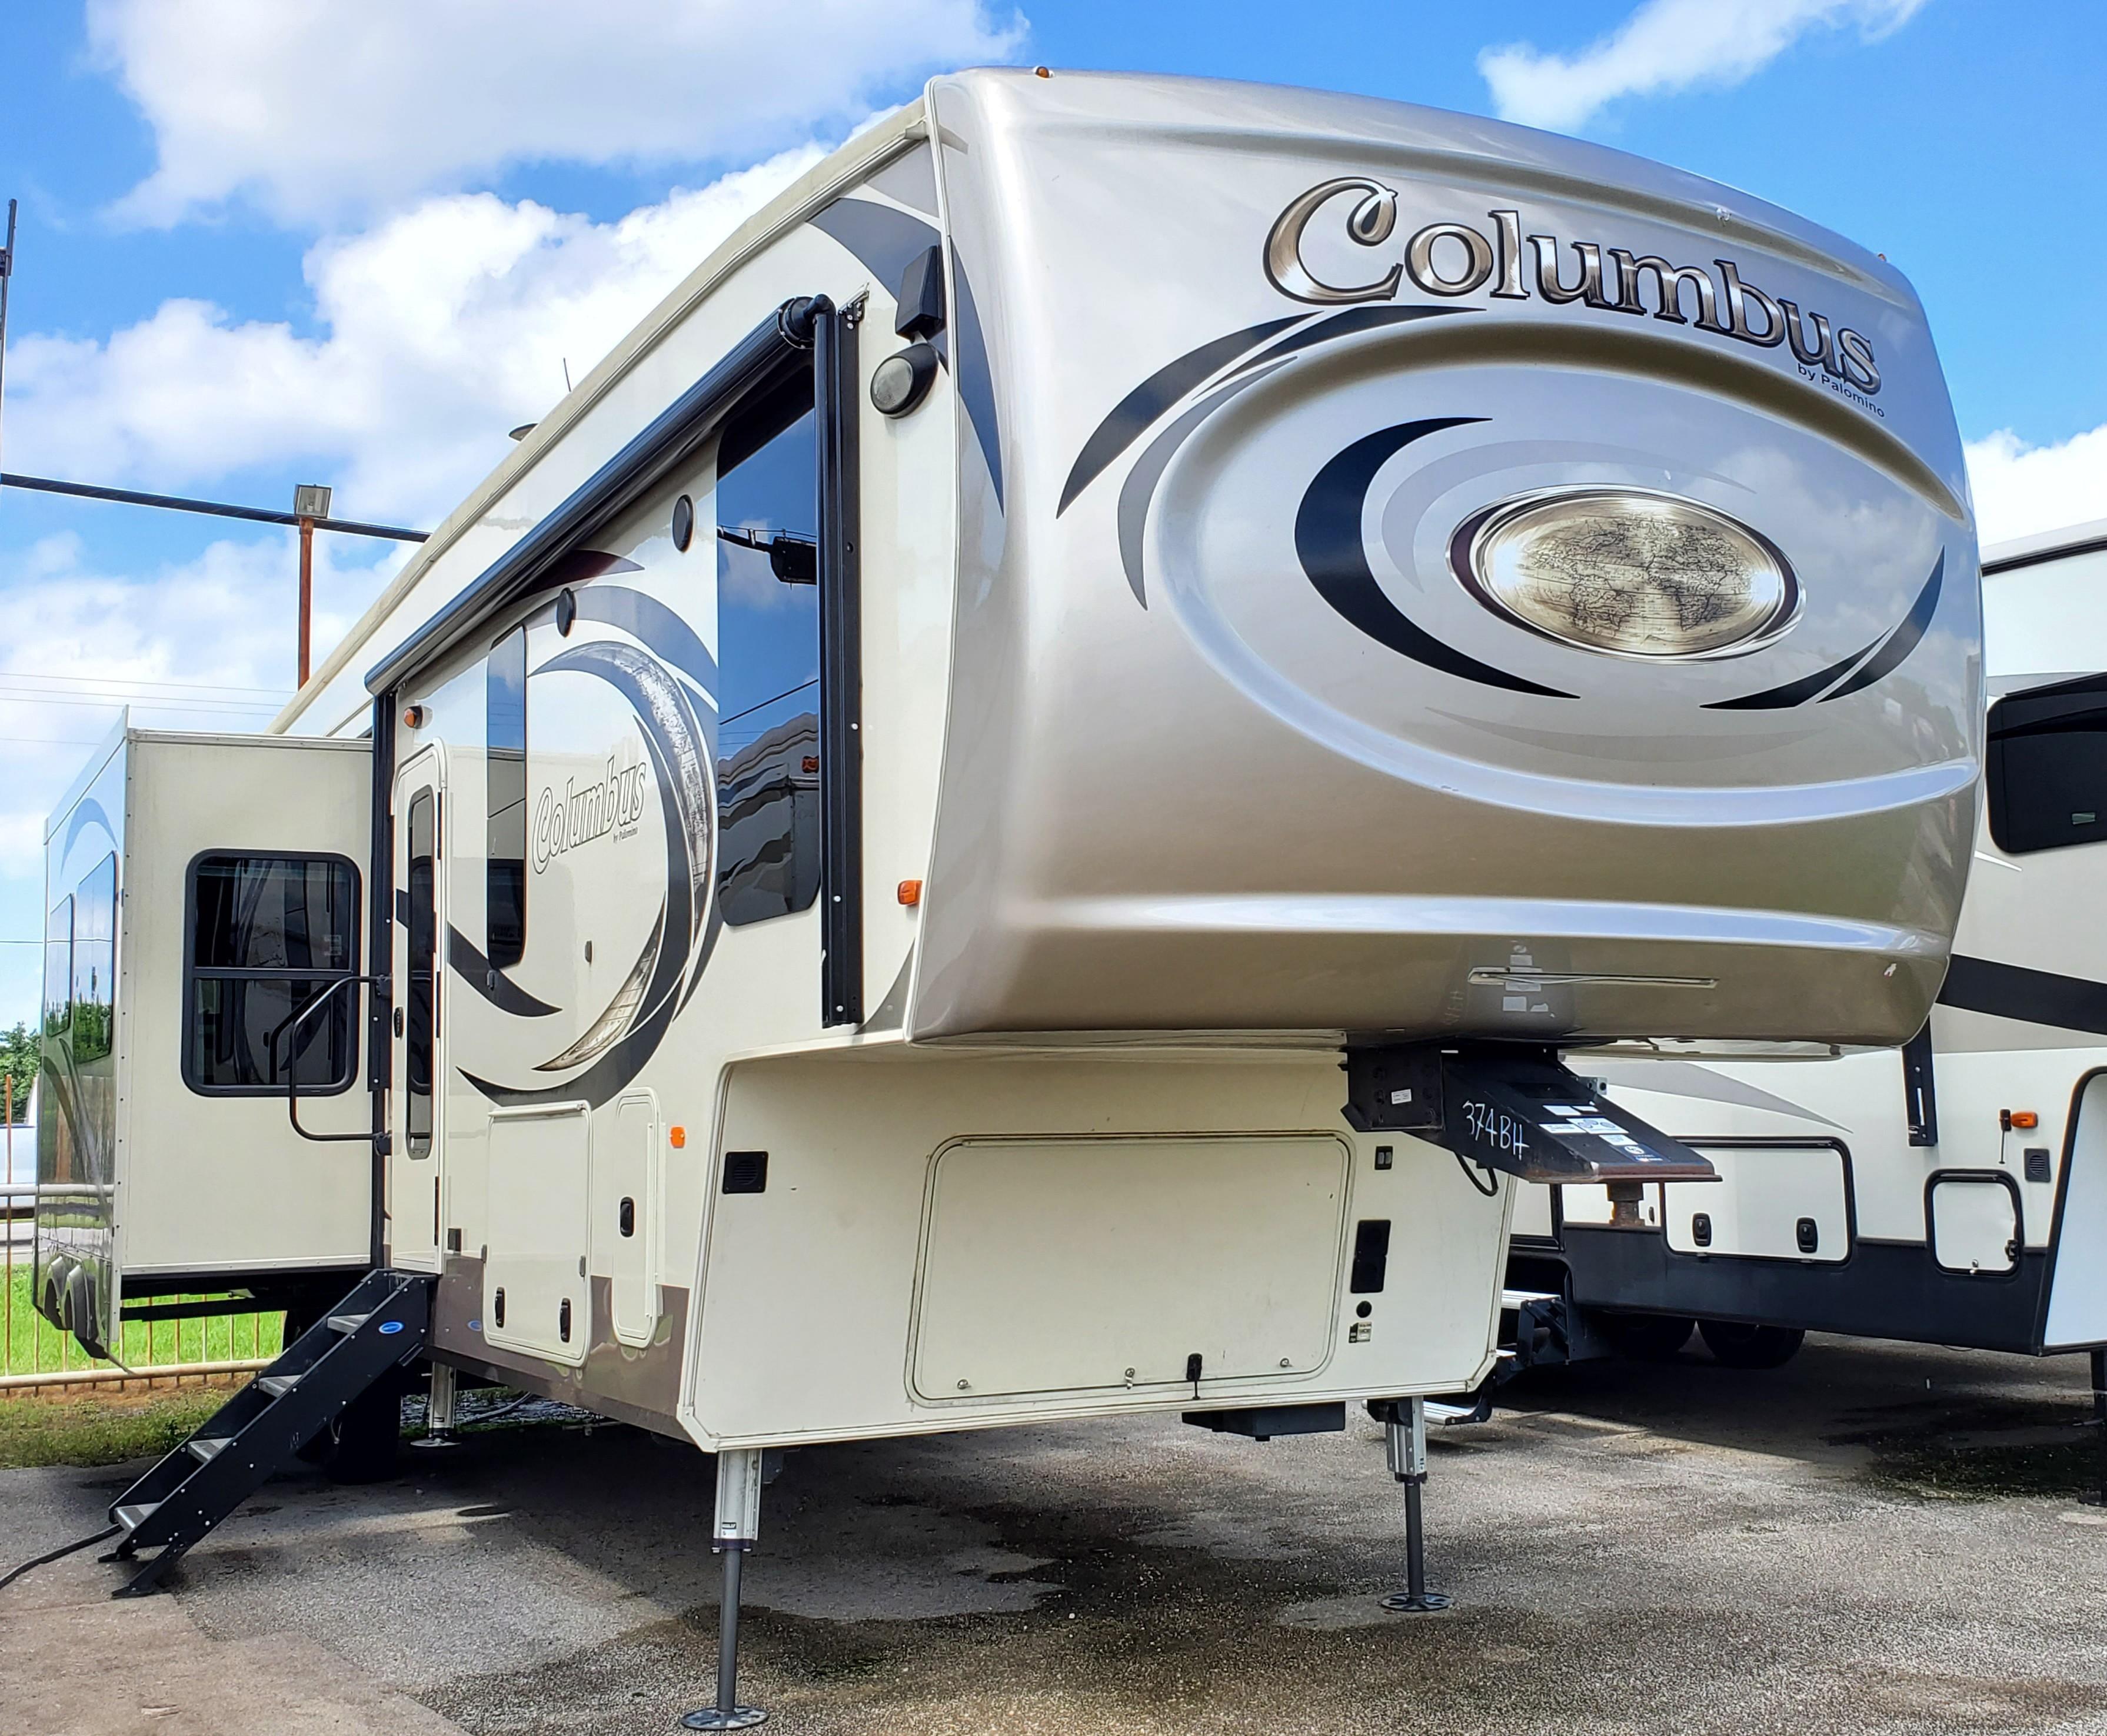 Used, 2019, Palomino, Columbus 374BH, Fifth Wheels